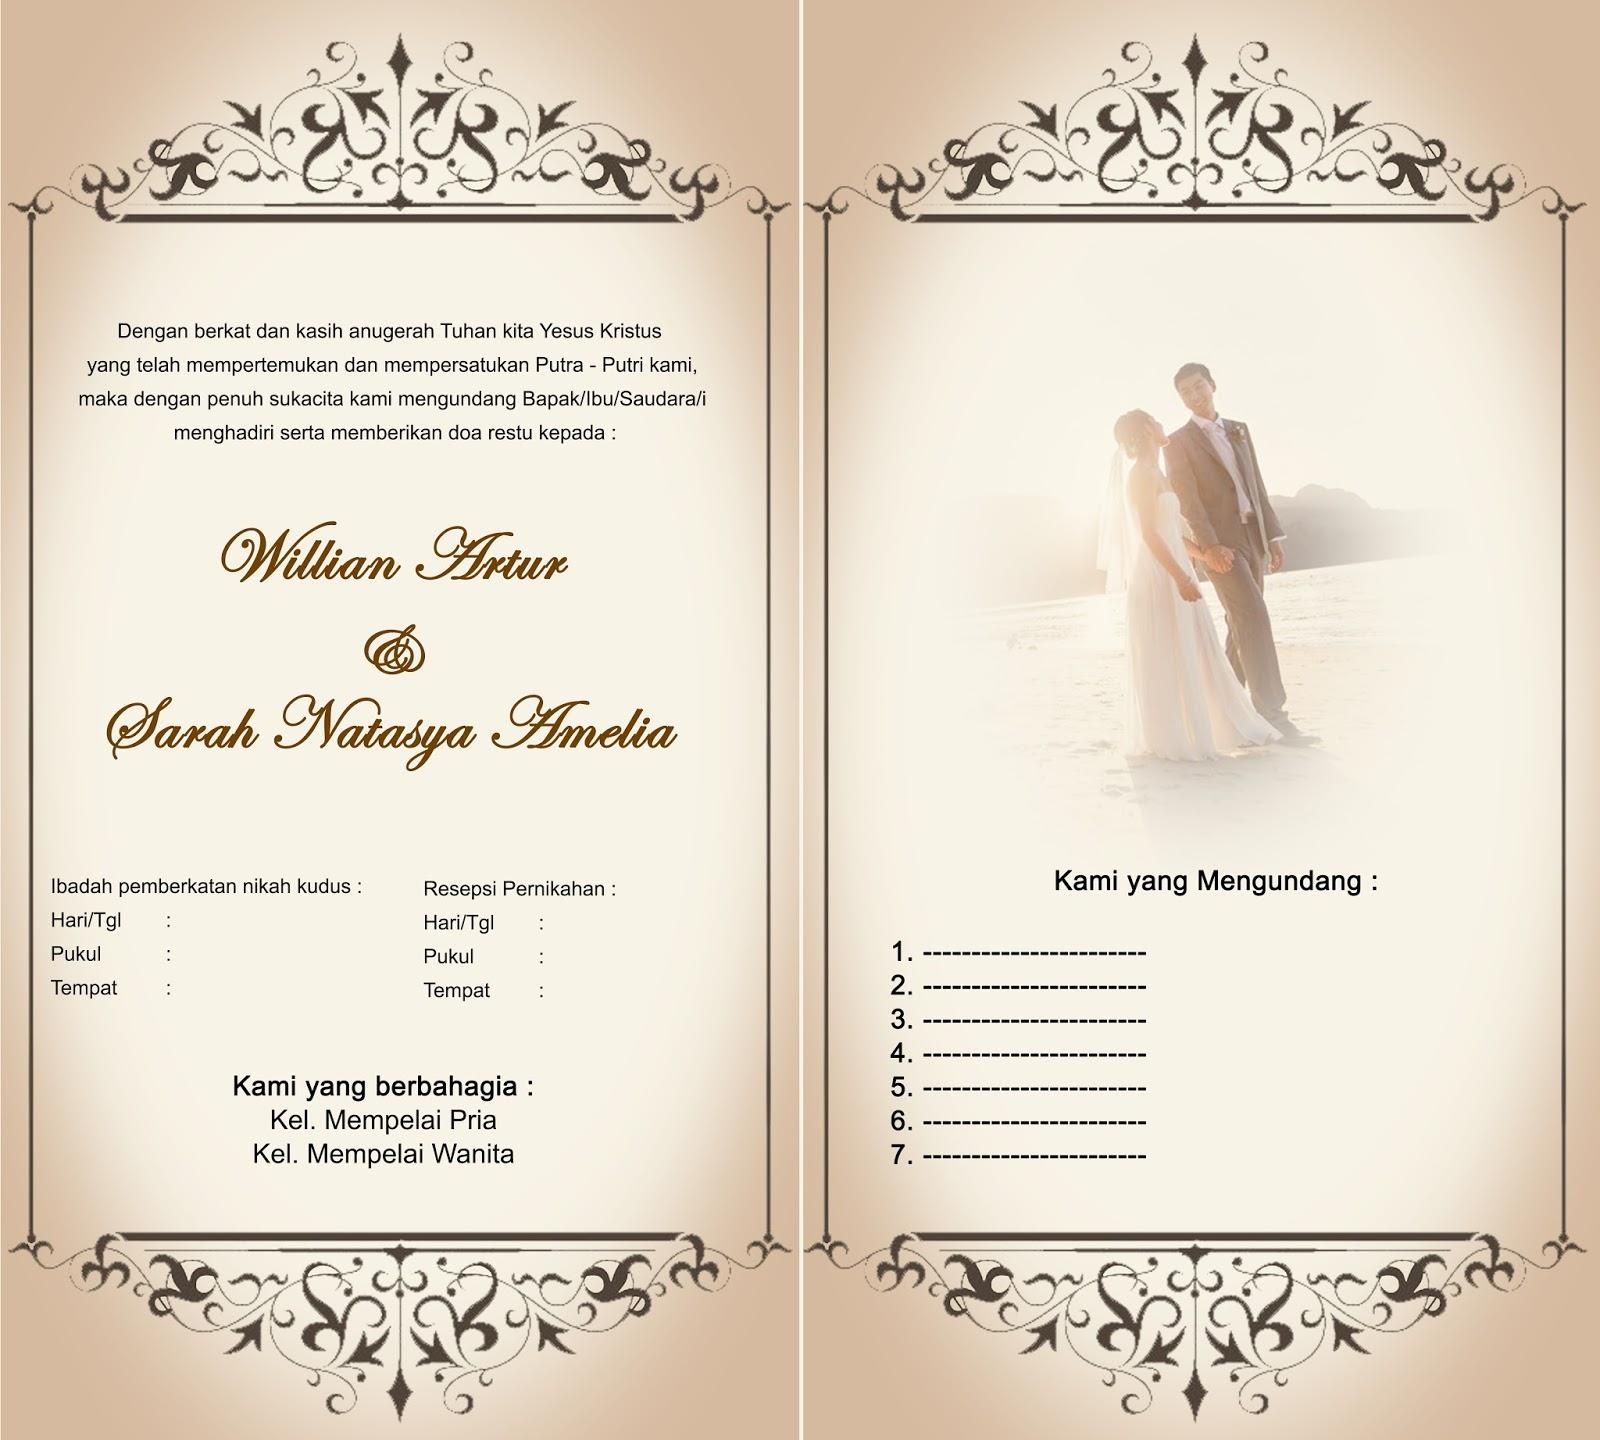 Membuat Undangan Pernikahan | Share The Knownledge